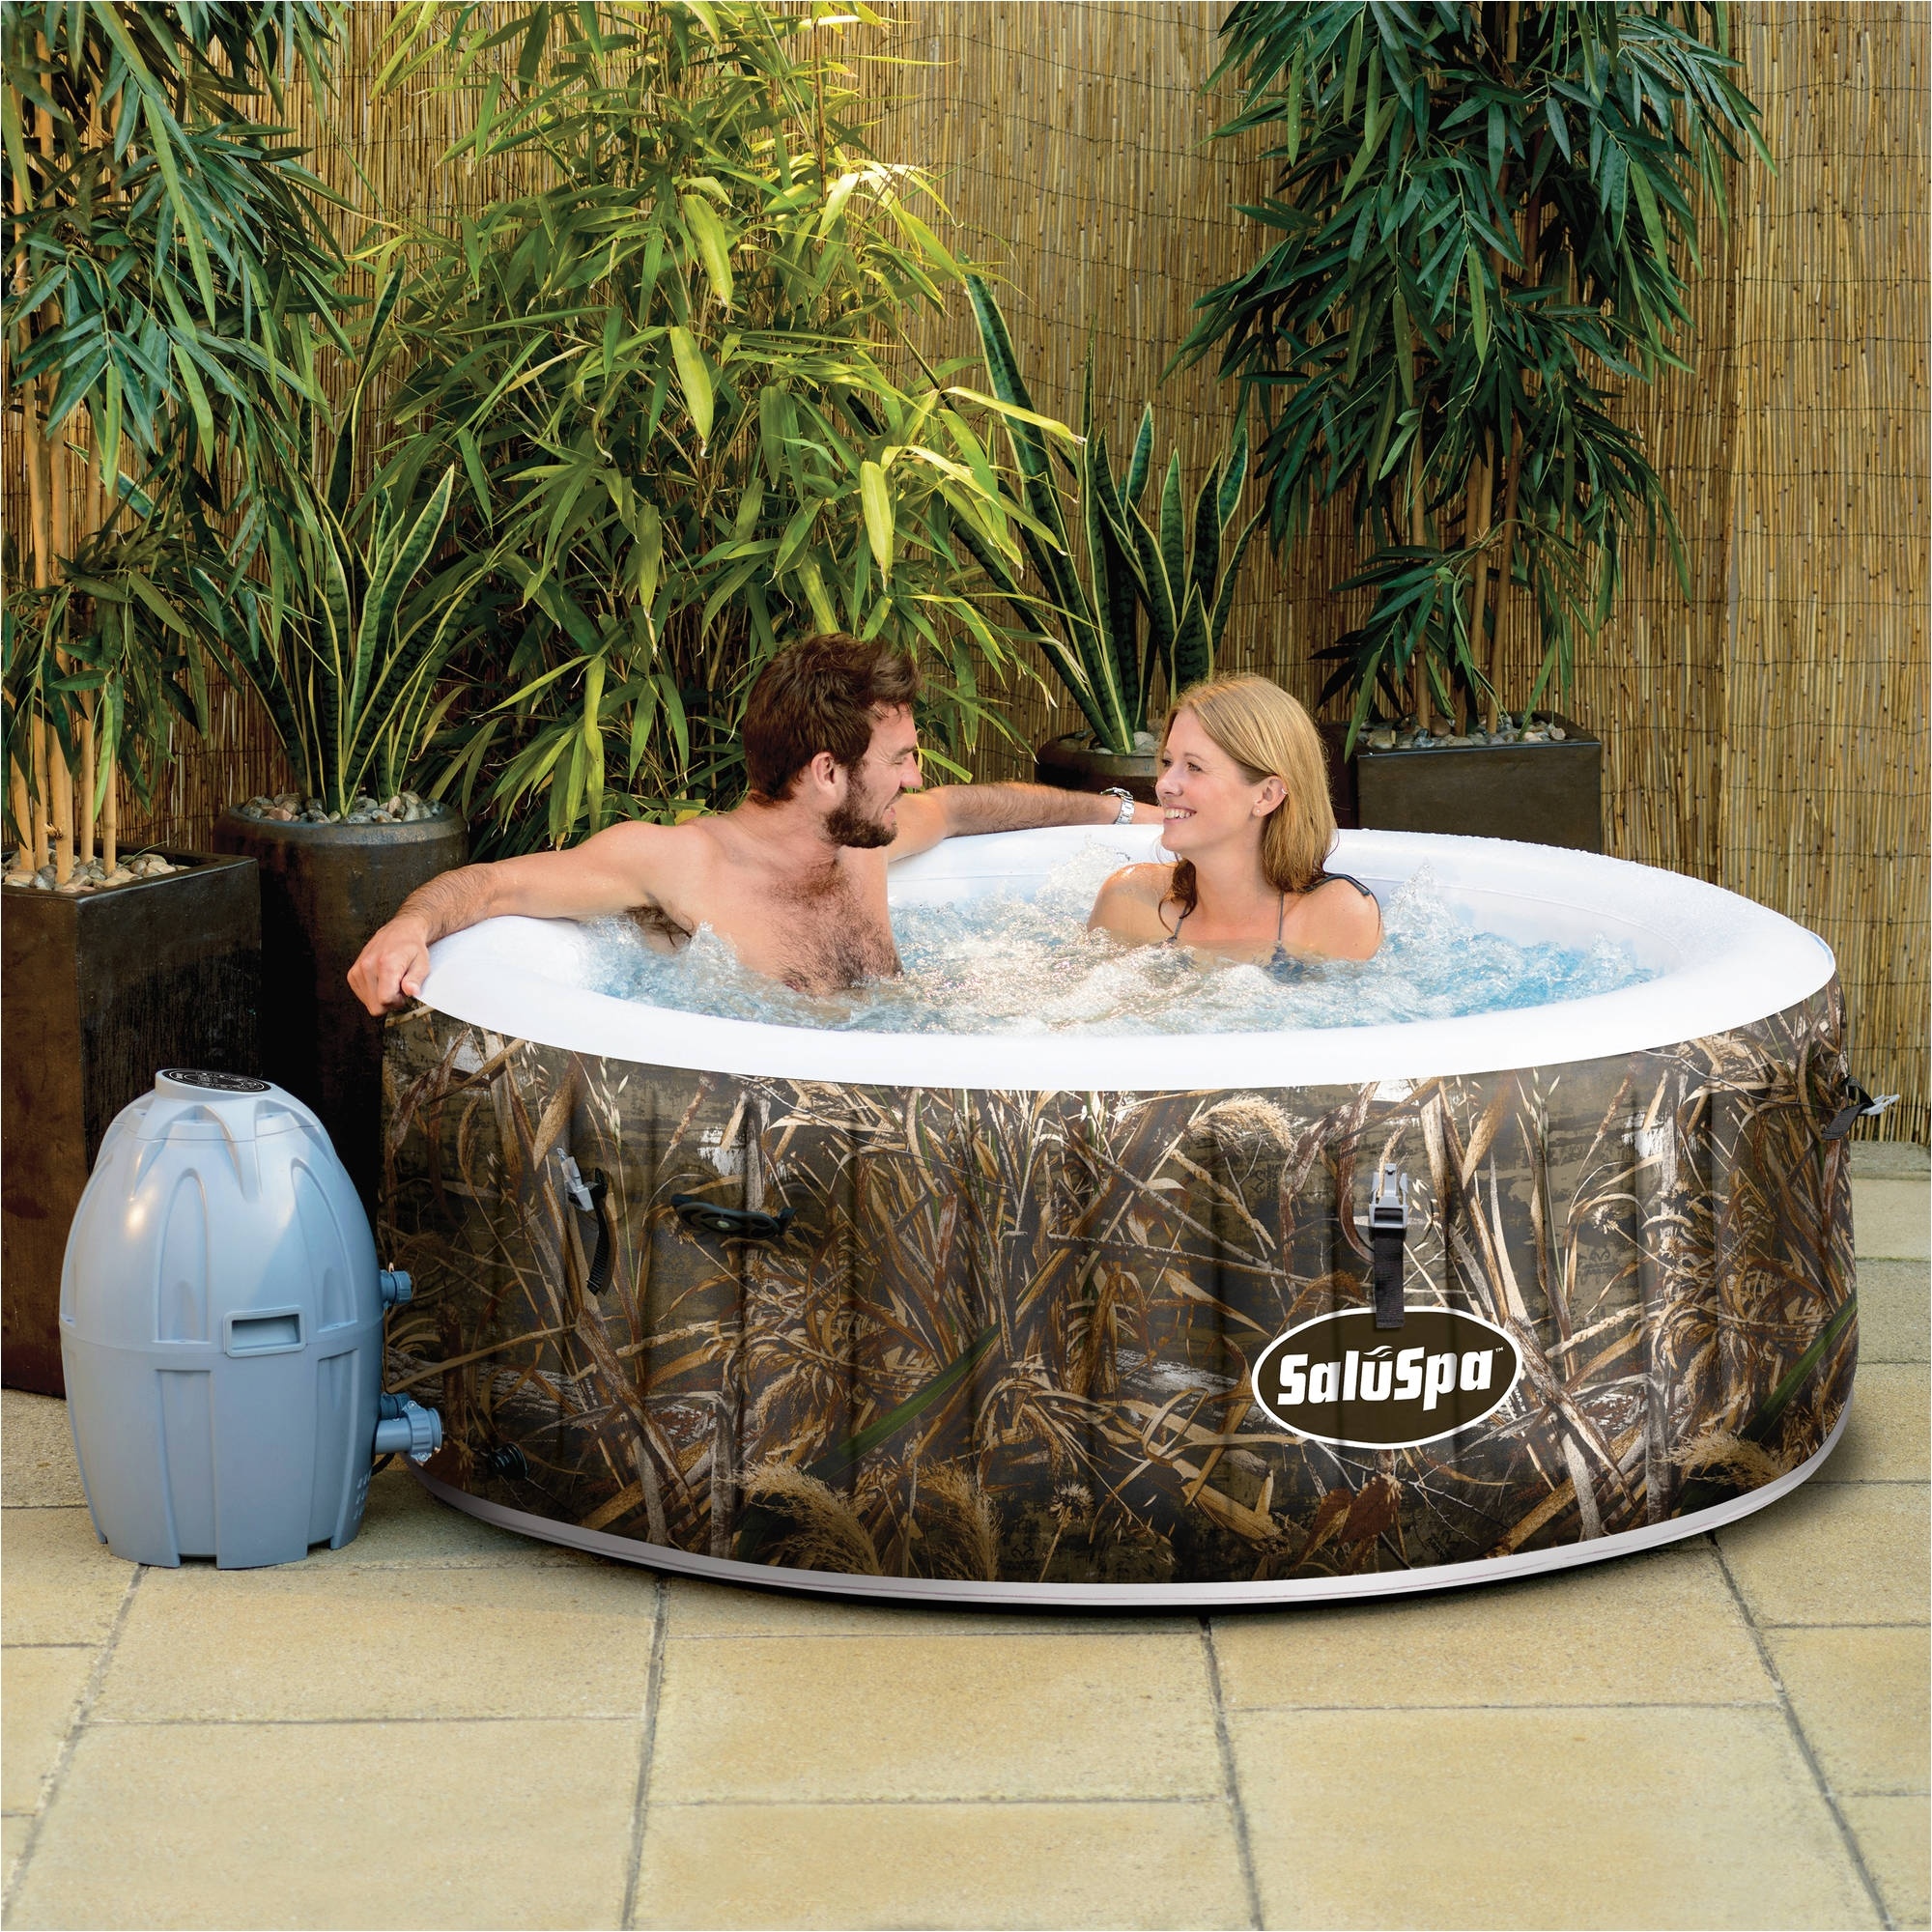 saluspa realtree max 5 airjet 4 person portable inflatable hot tub spa walmart com